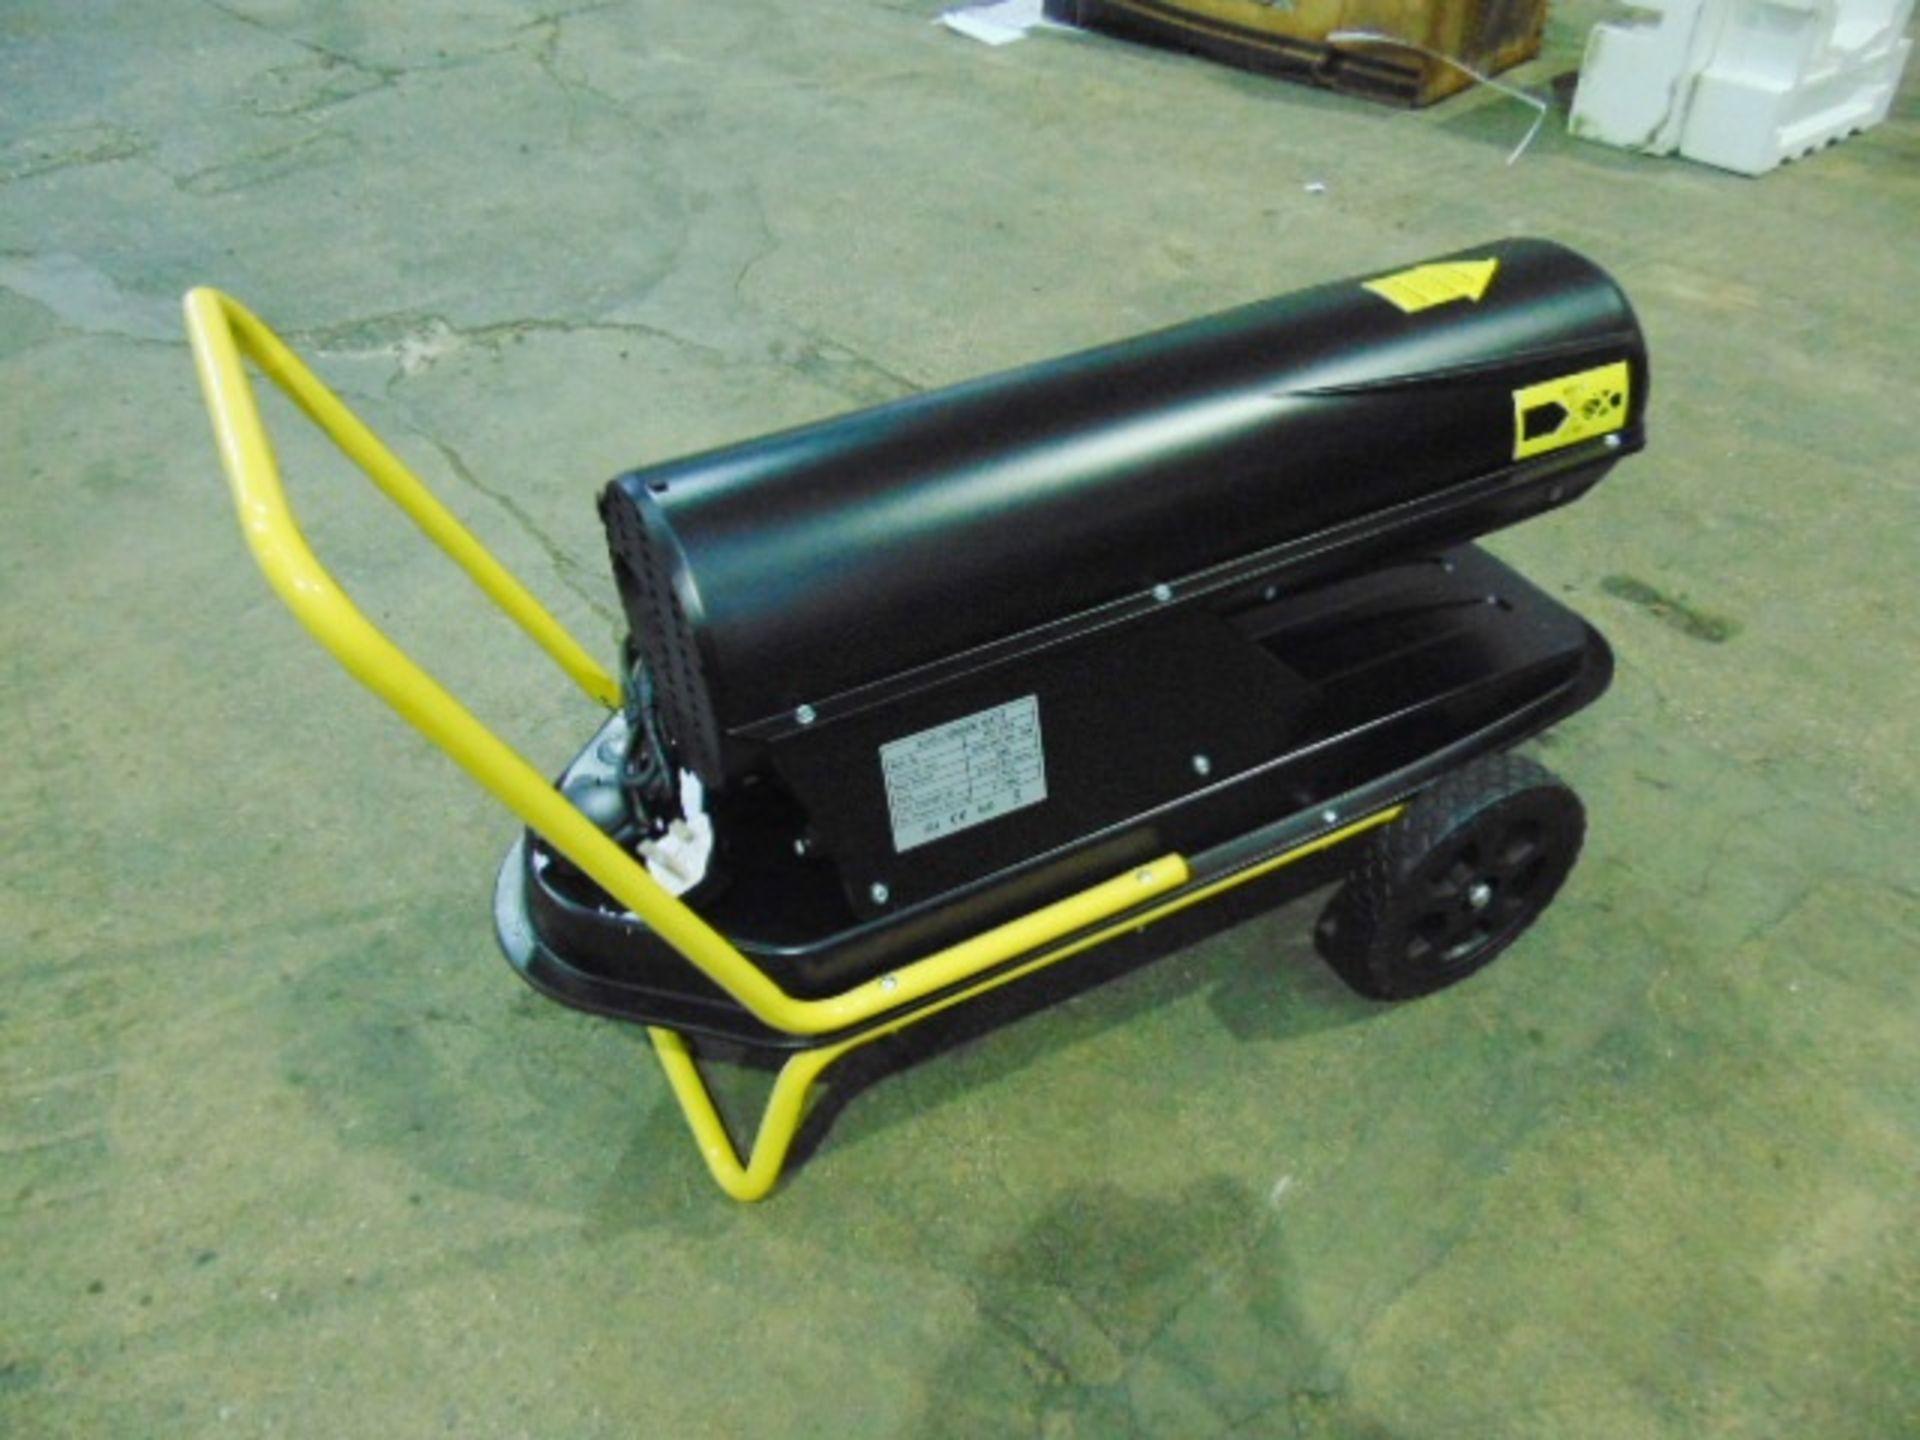 Lot 34 - ** BRAND NEW ** XDFT-20 Diesel Space Heater